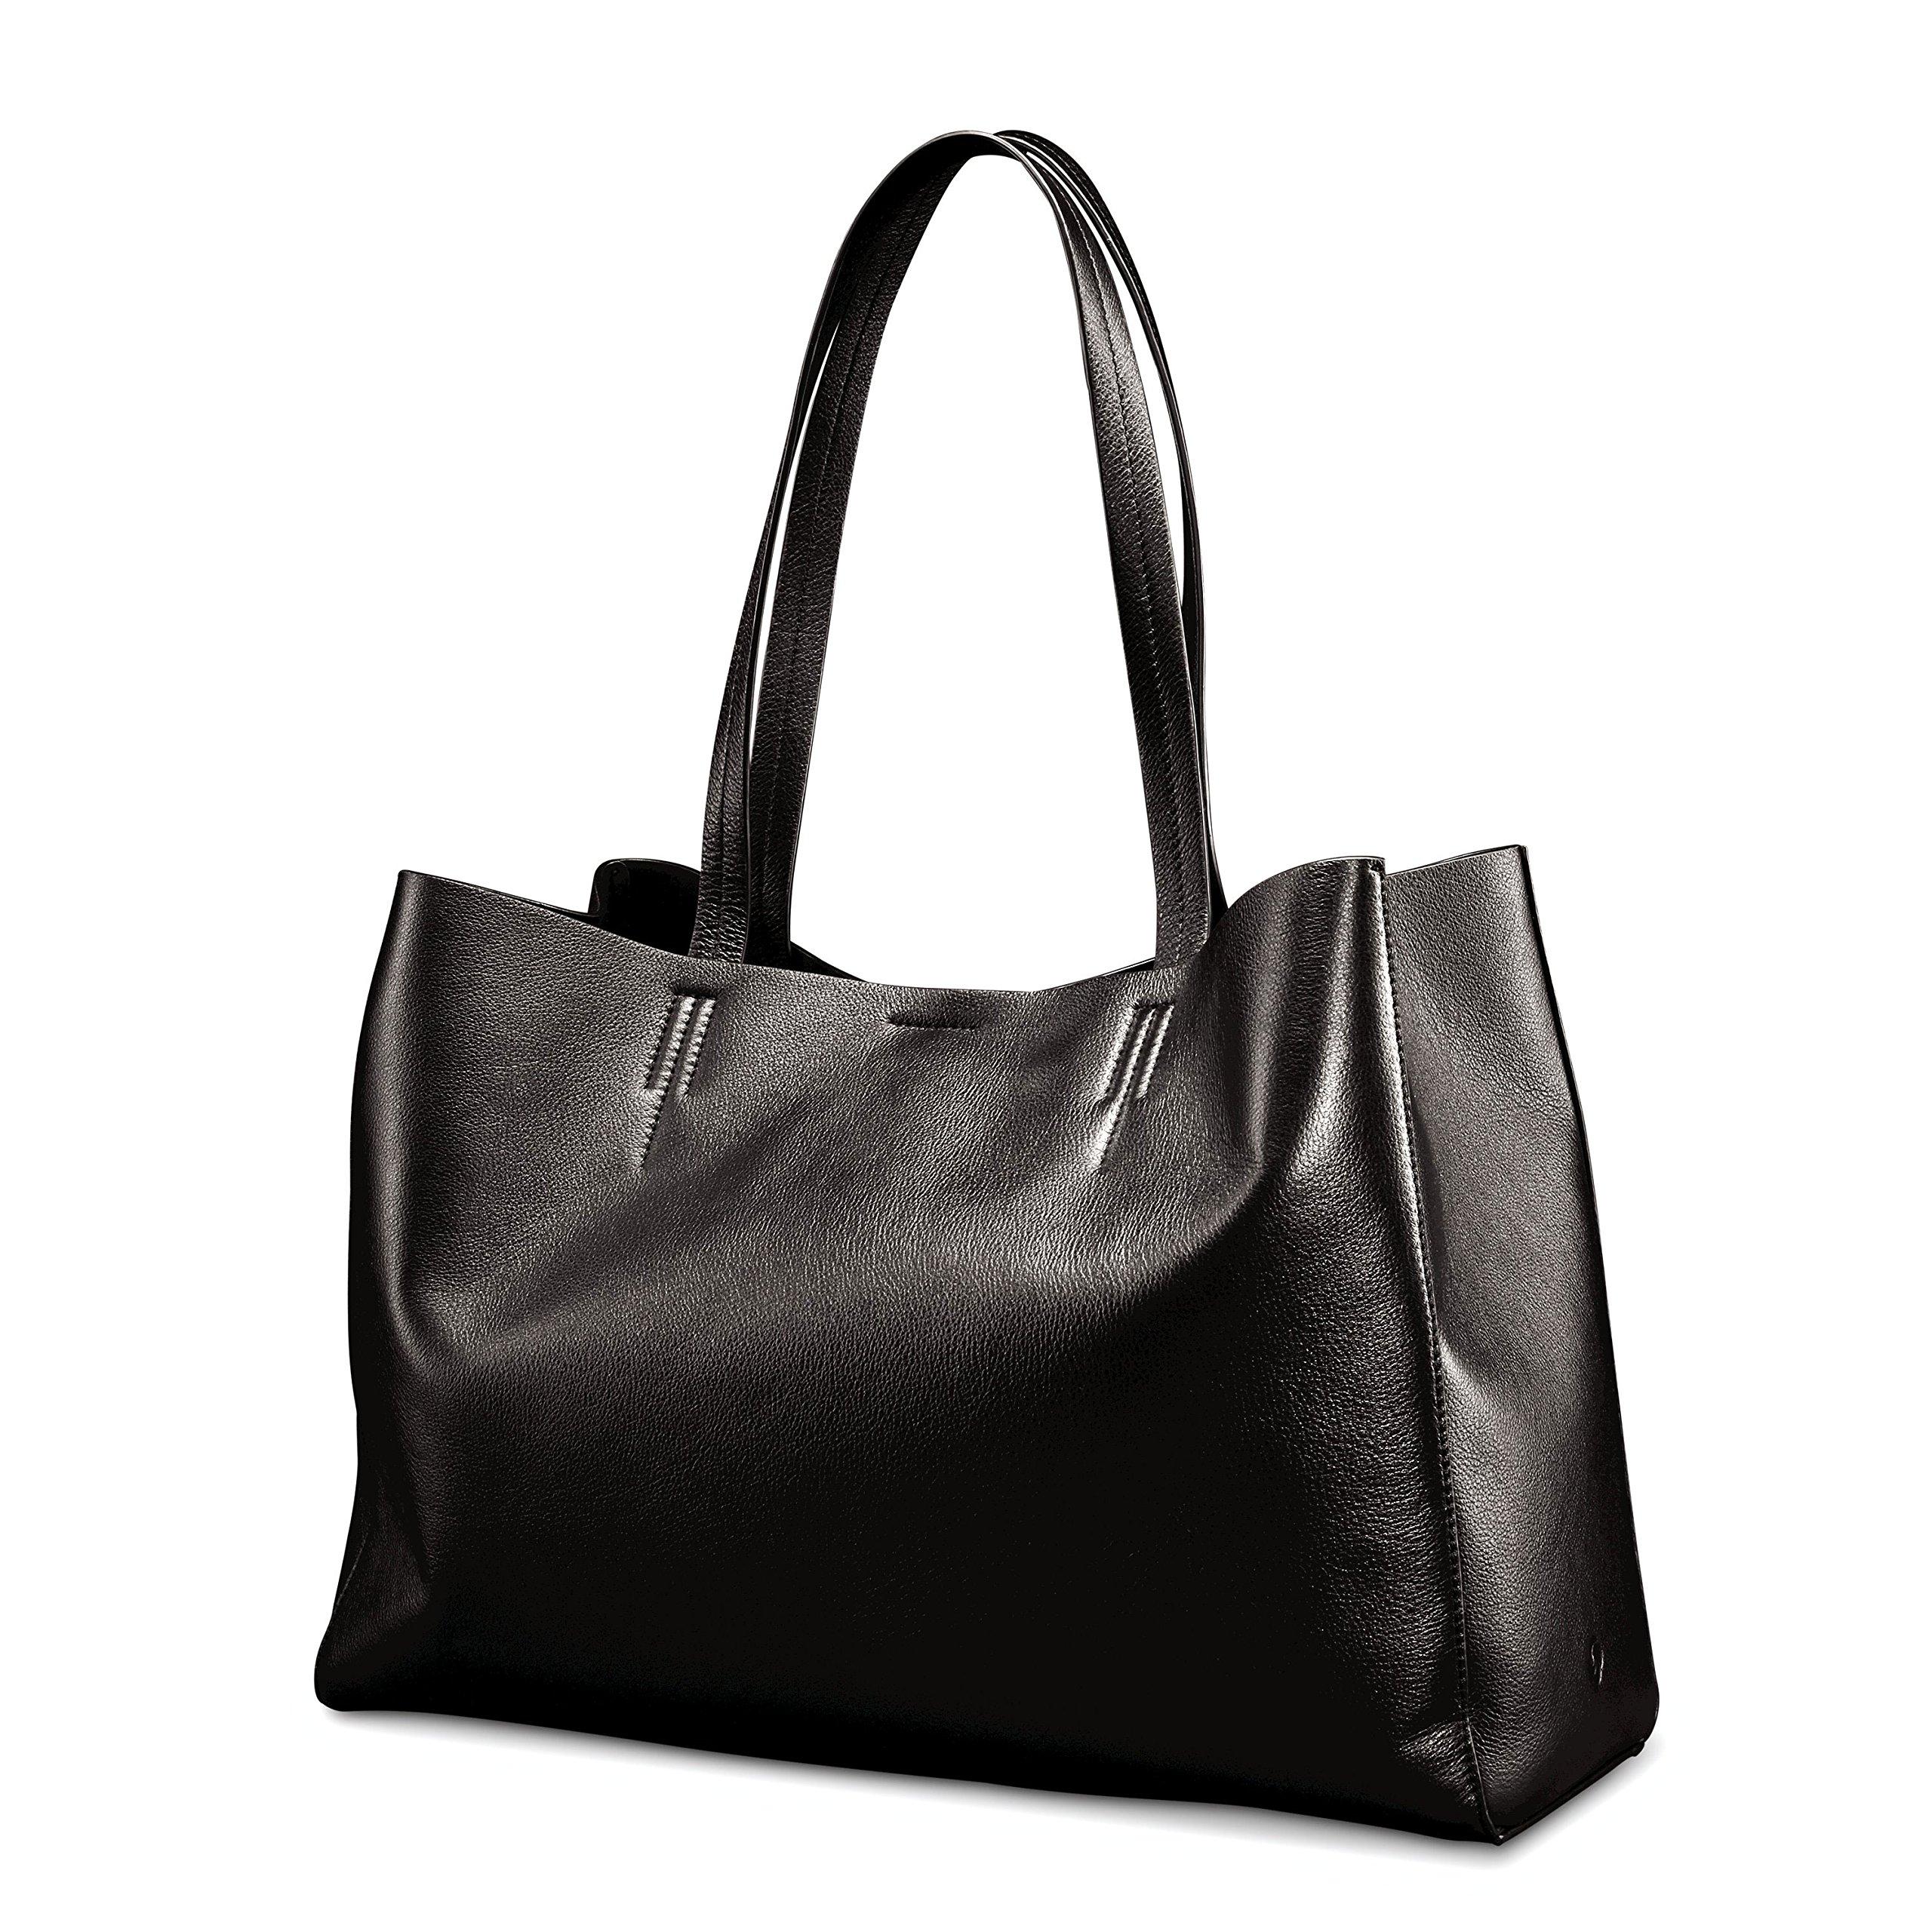 Samsonite Business Leather Tote Black